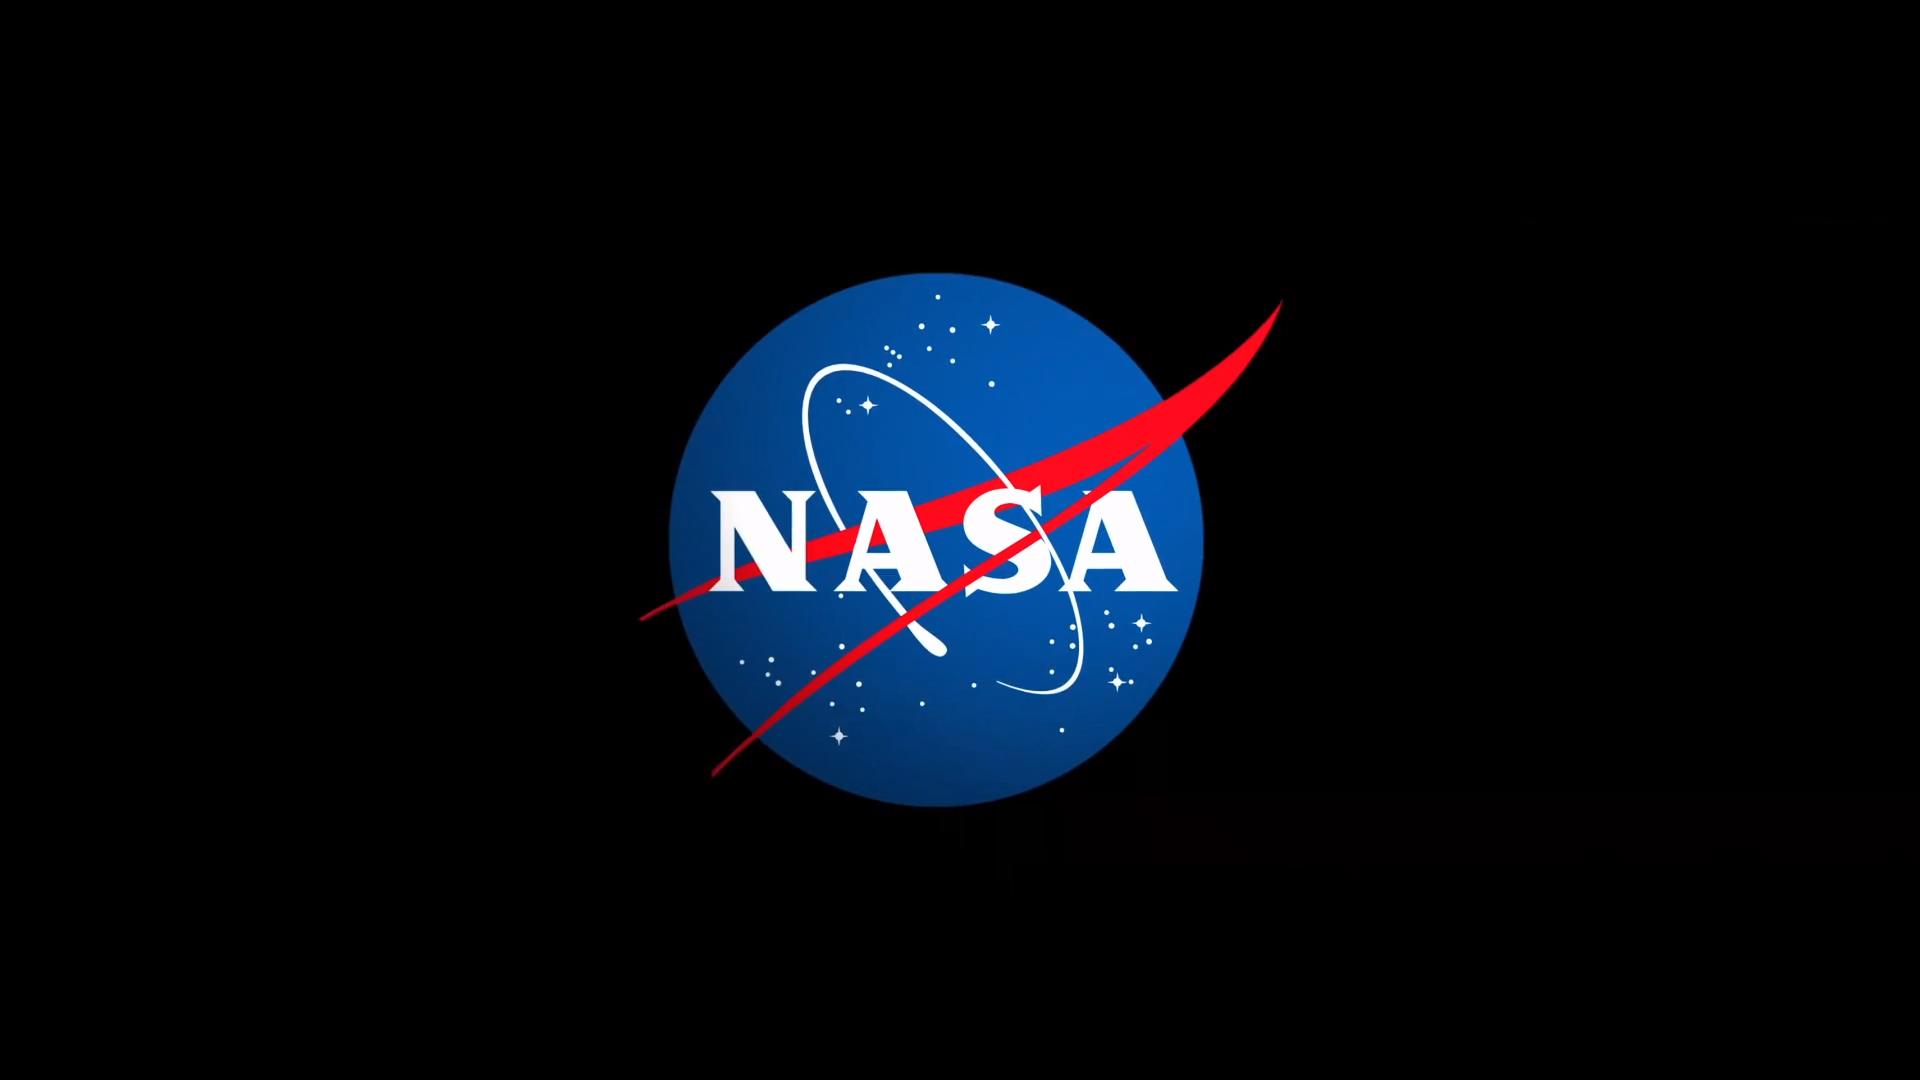 Nasa Logo Wallpapers 1920x1080